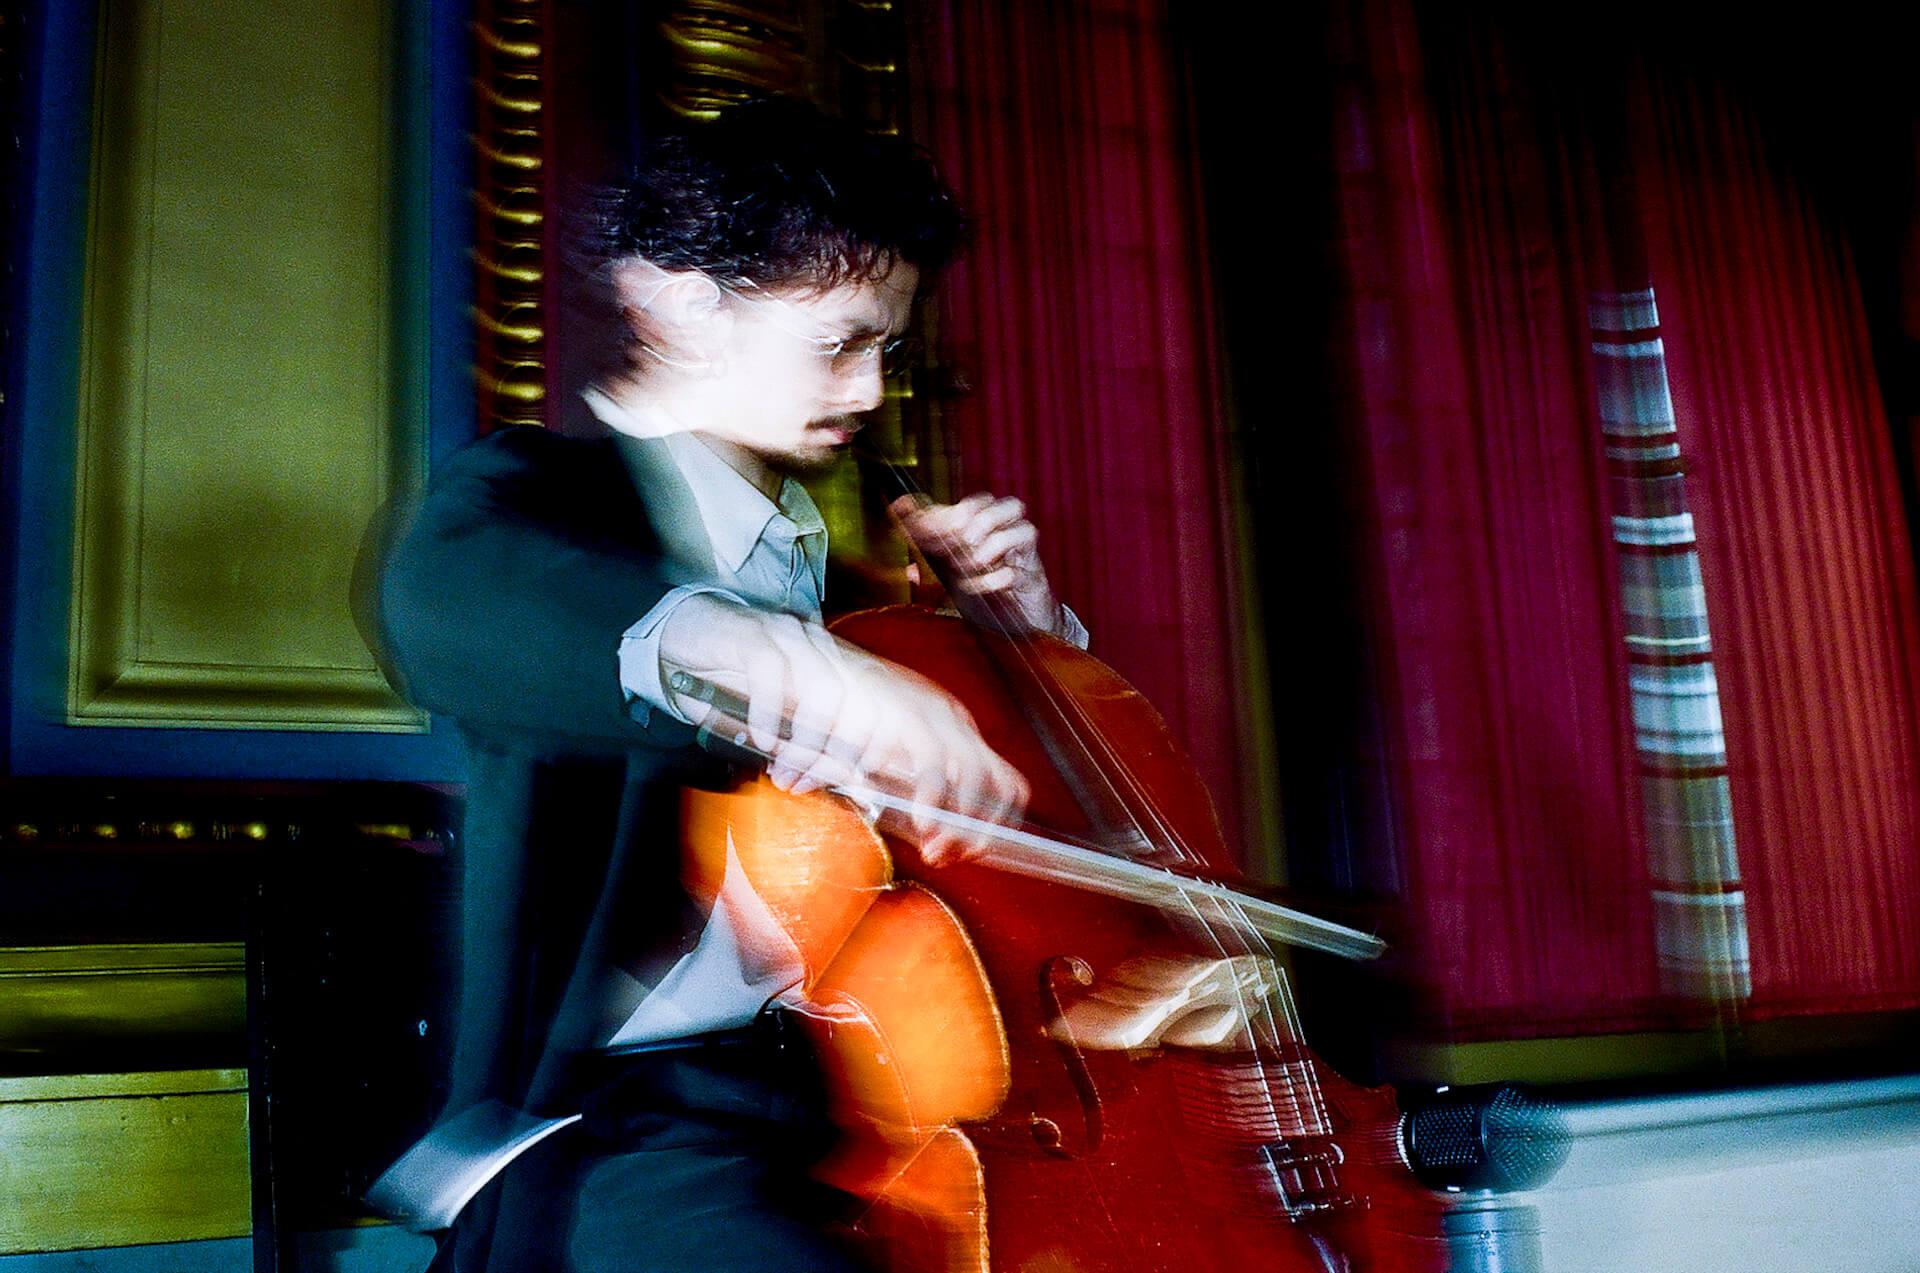 King Gnu常田大希が敢行したN.HOLLYWOODのNYコレクションでのチェロ演奏がアナログ盤でリリース決定! music200529_tsunetadaiki_2